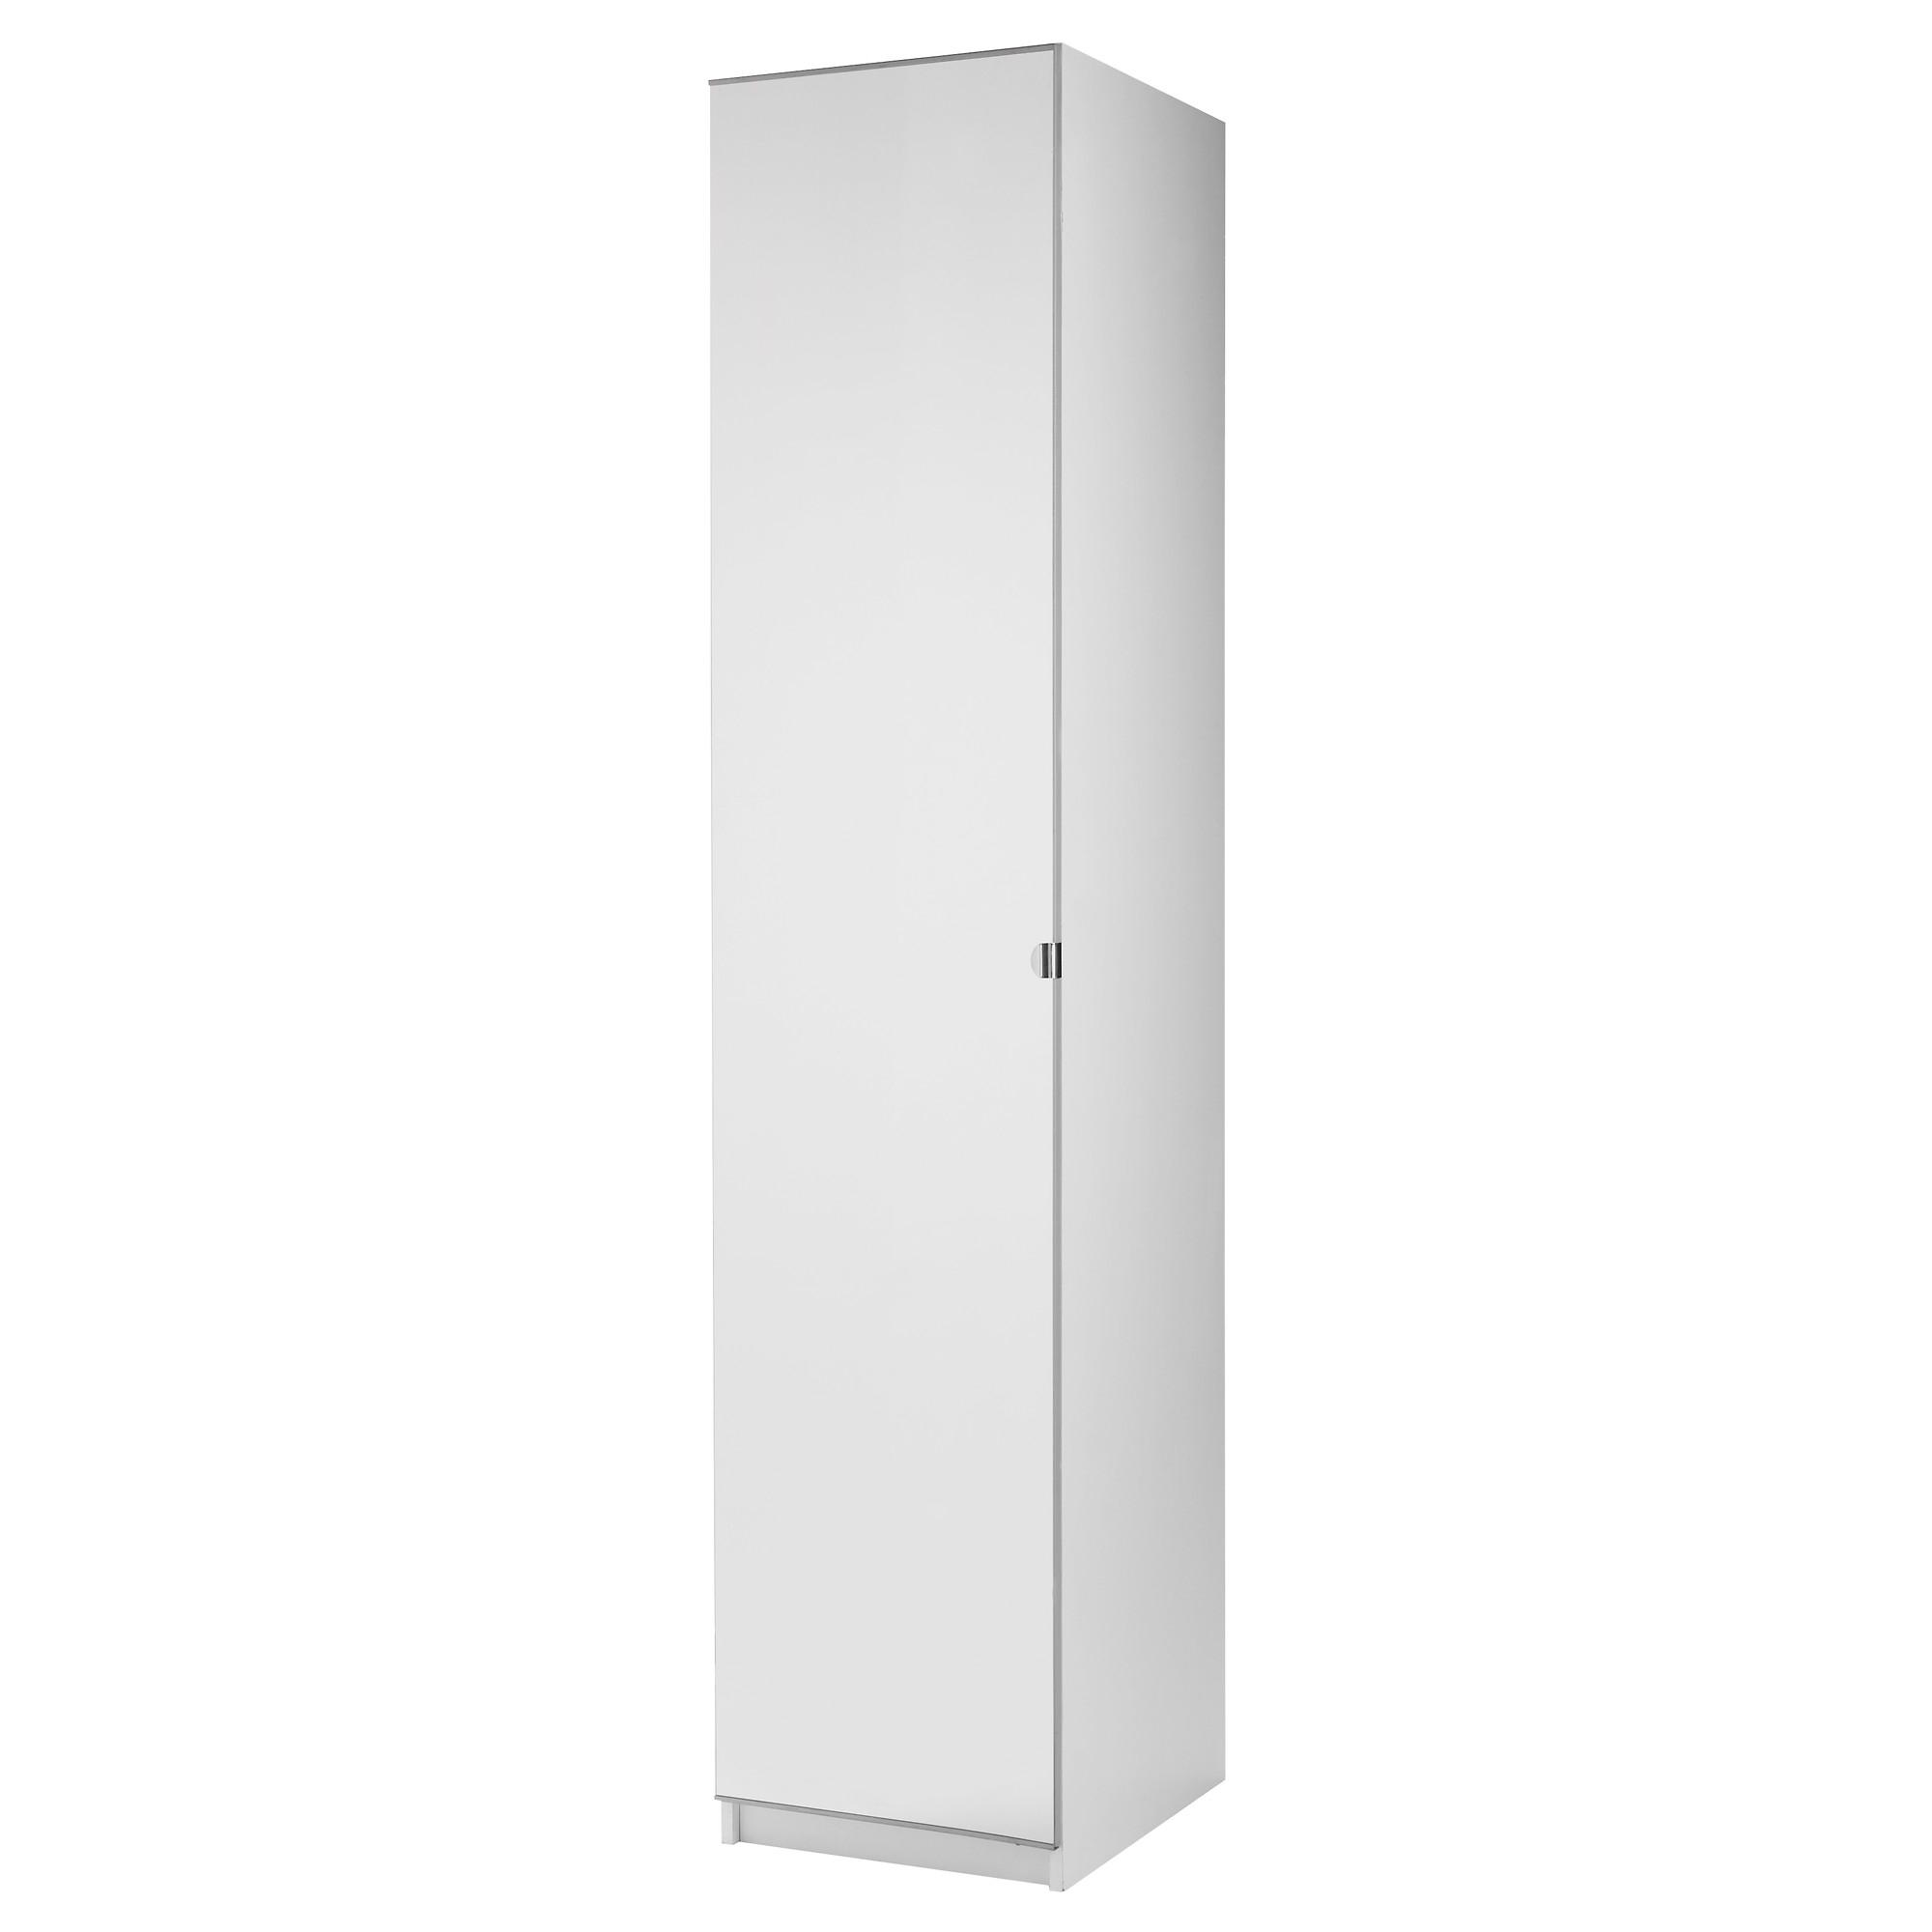 Pax armario con 1 puerta - Armarios modulares ikea ...